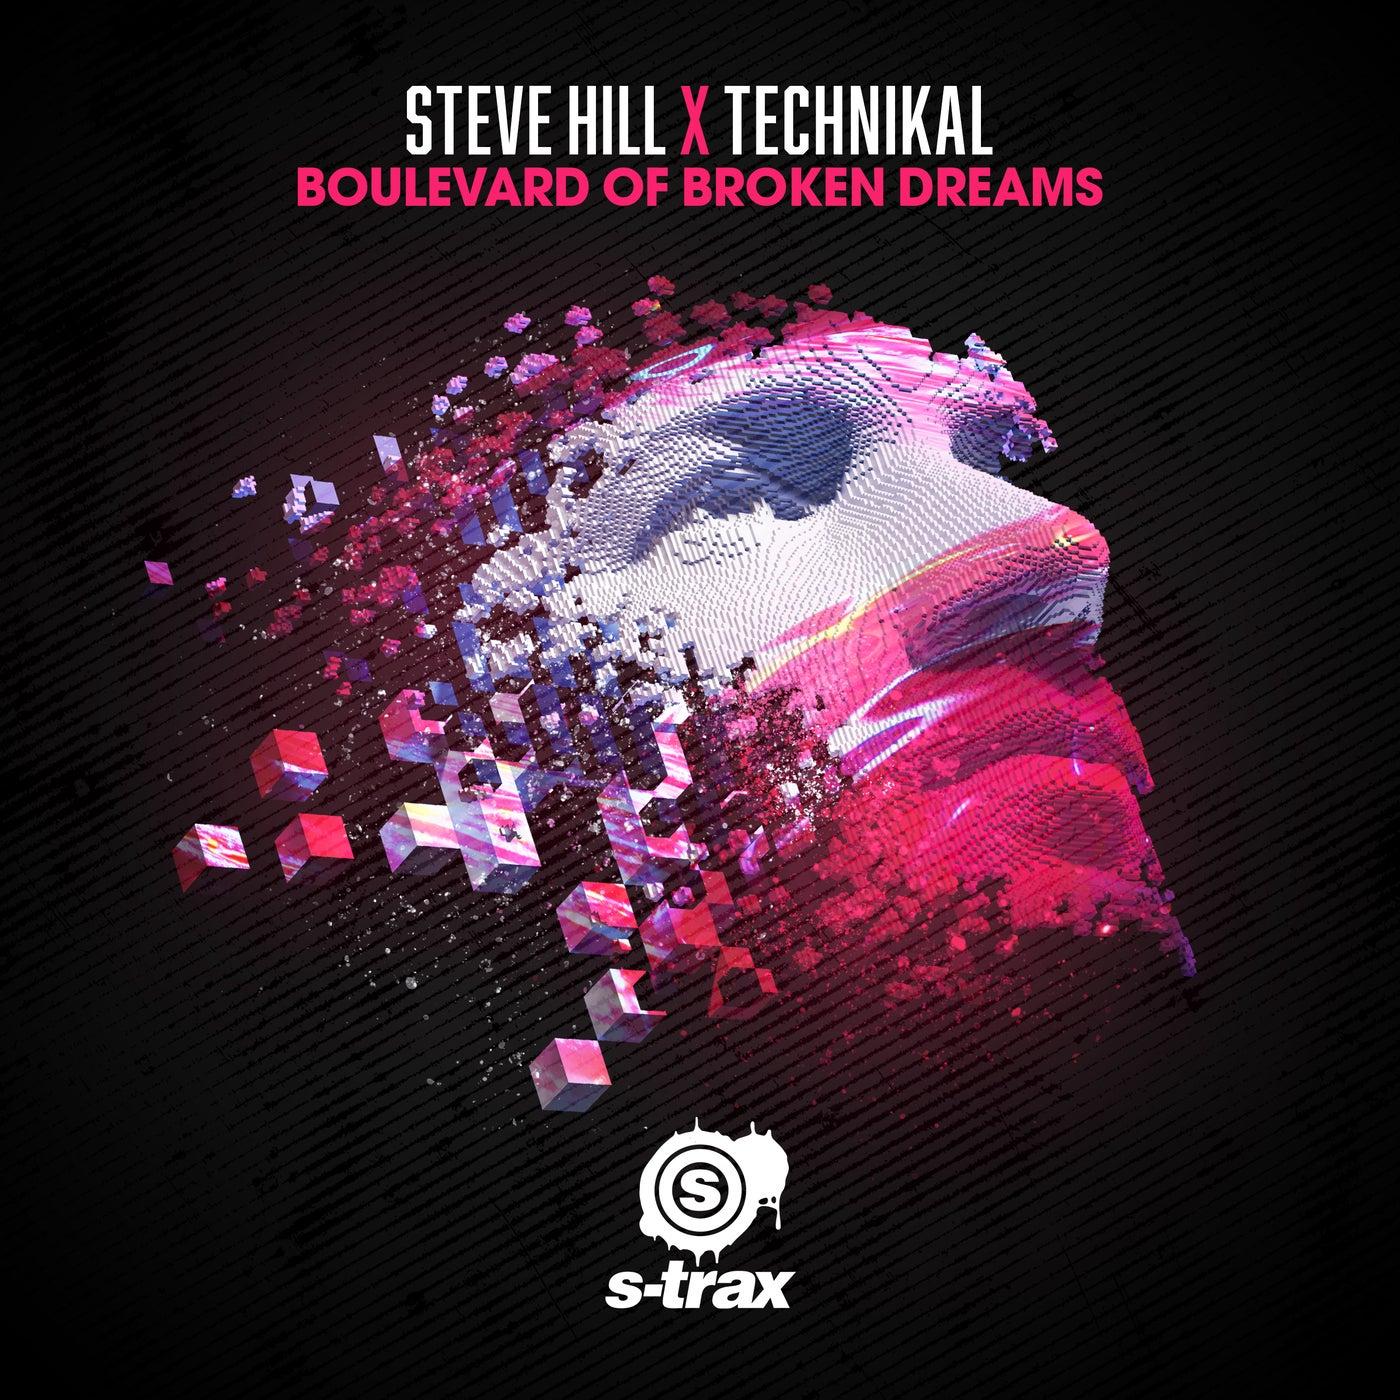 Boulevard of Broken Dreams (Extended Mix)